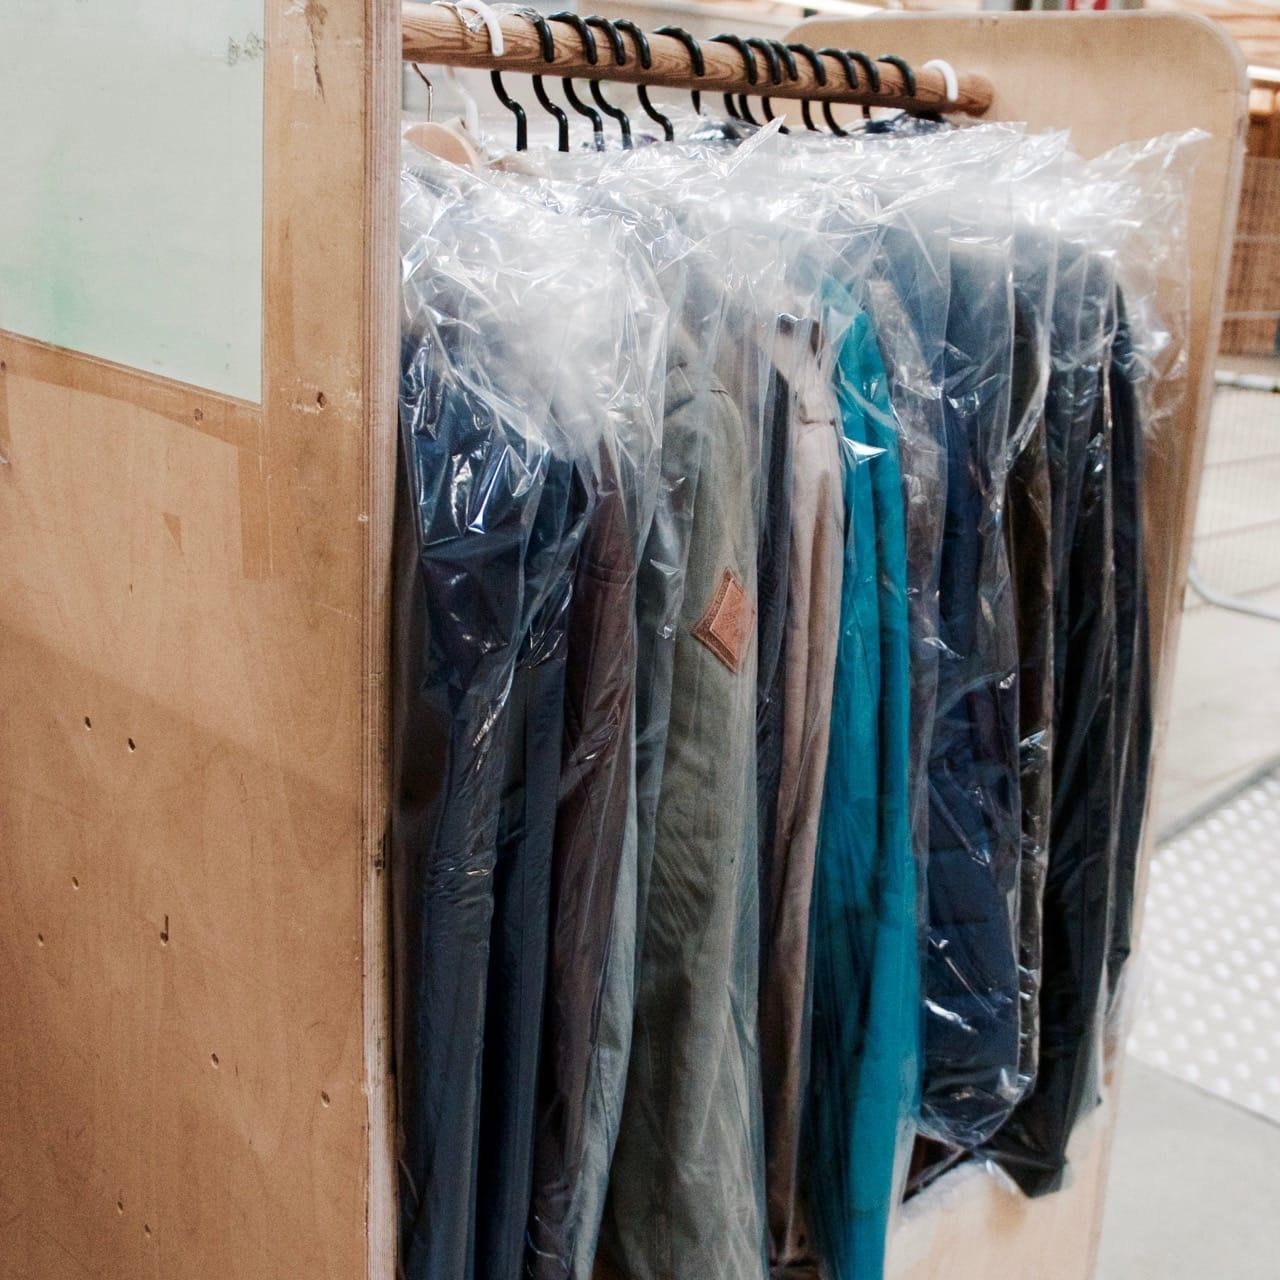 DASISTmomox fashion - Folge mir durch unser Lager 38